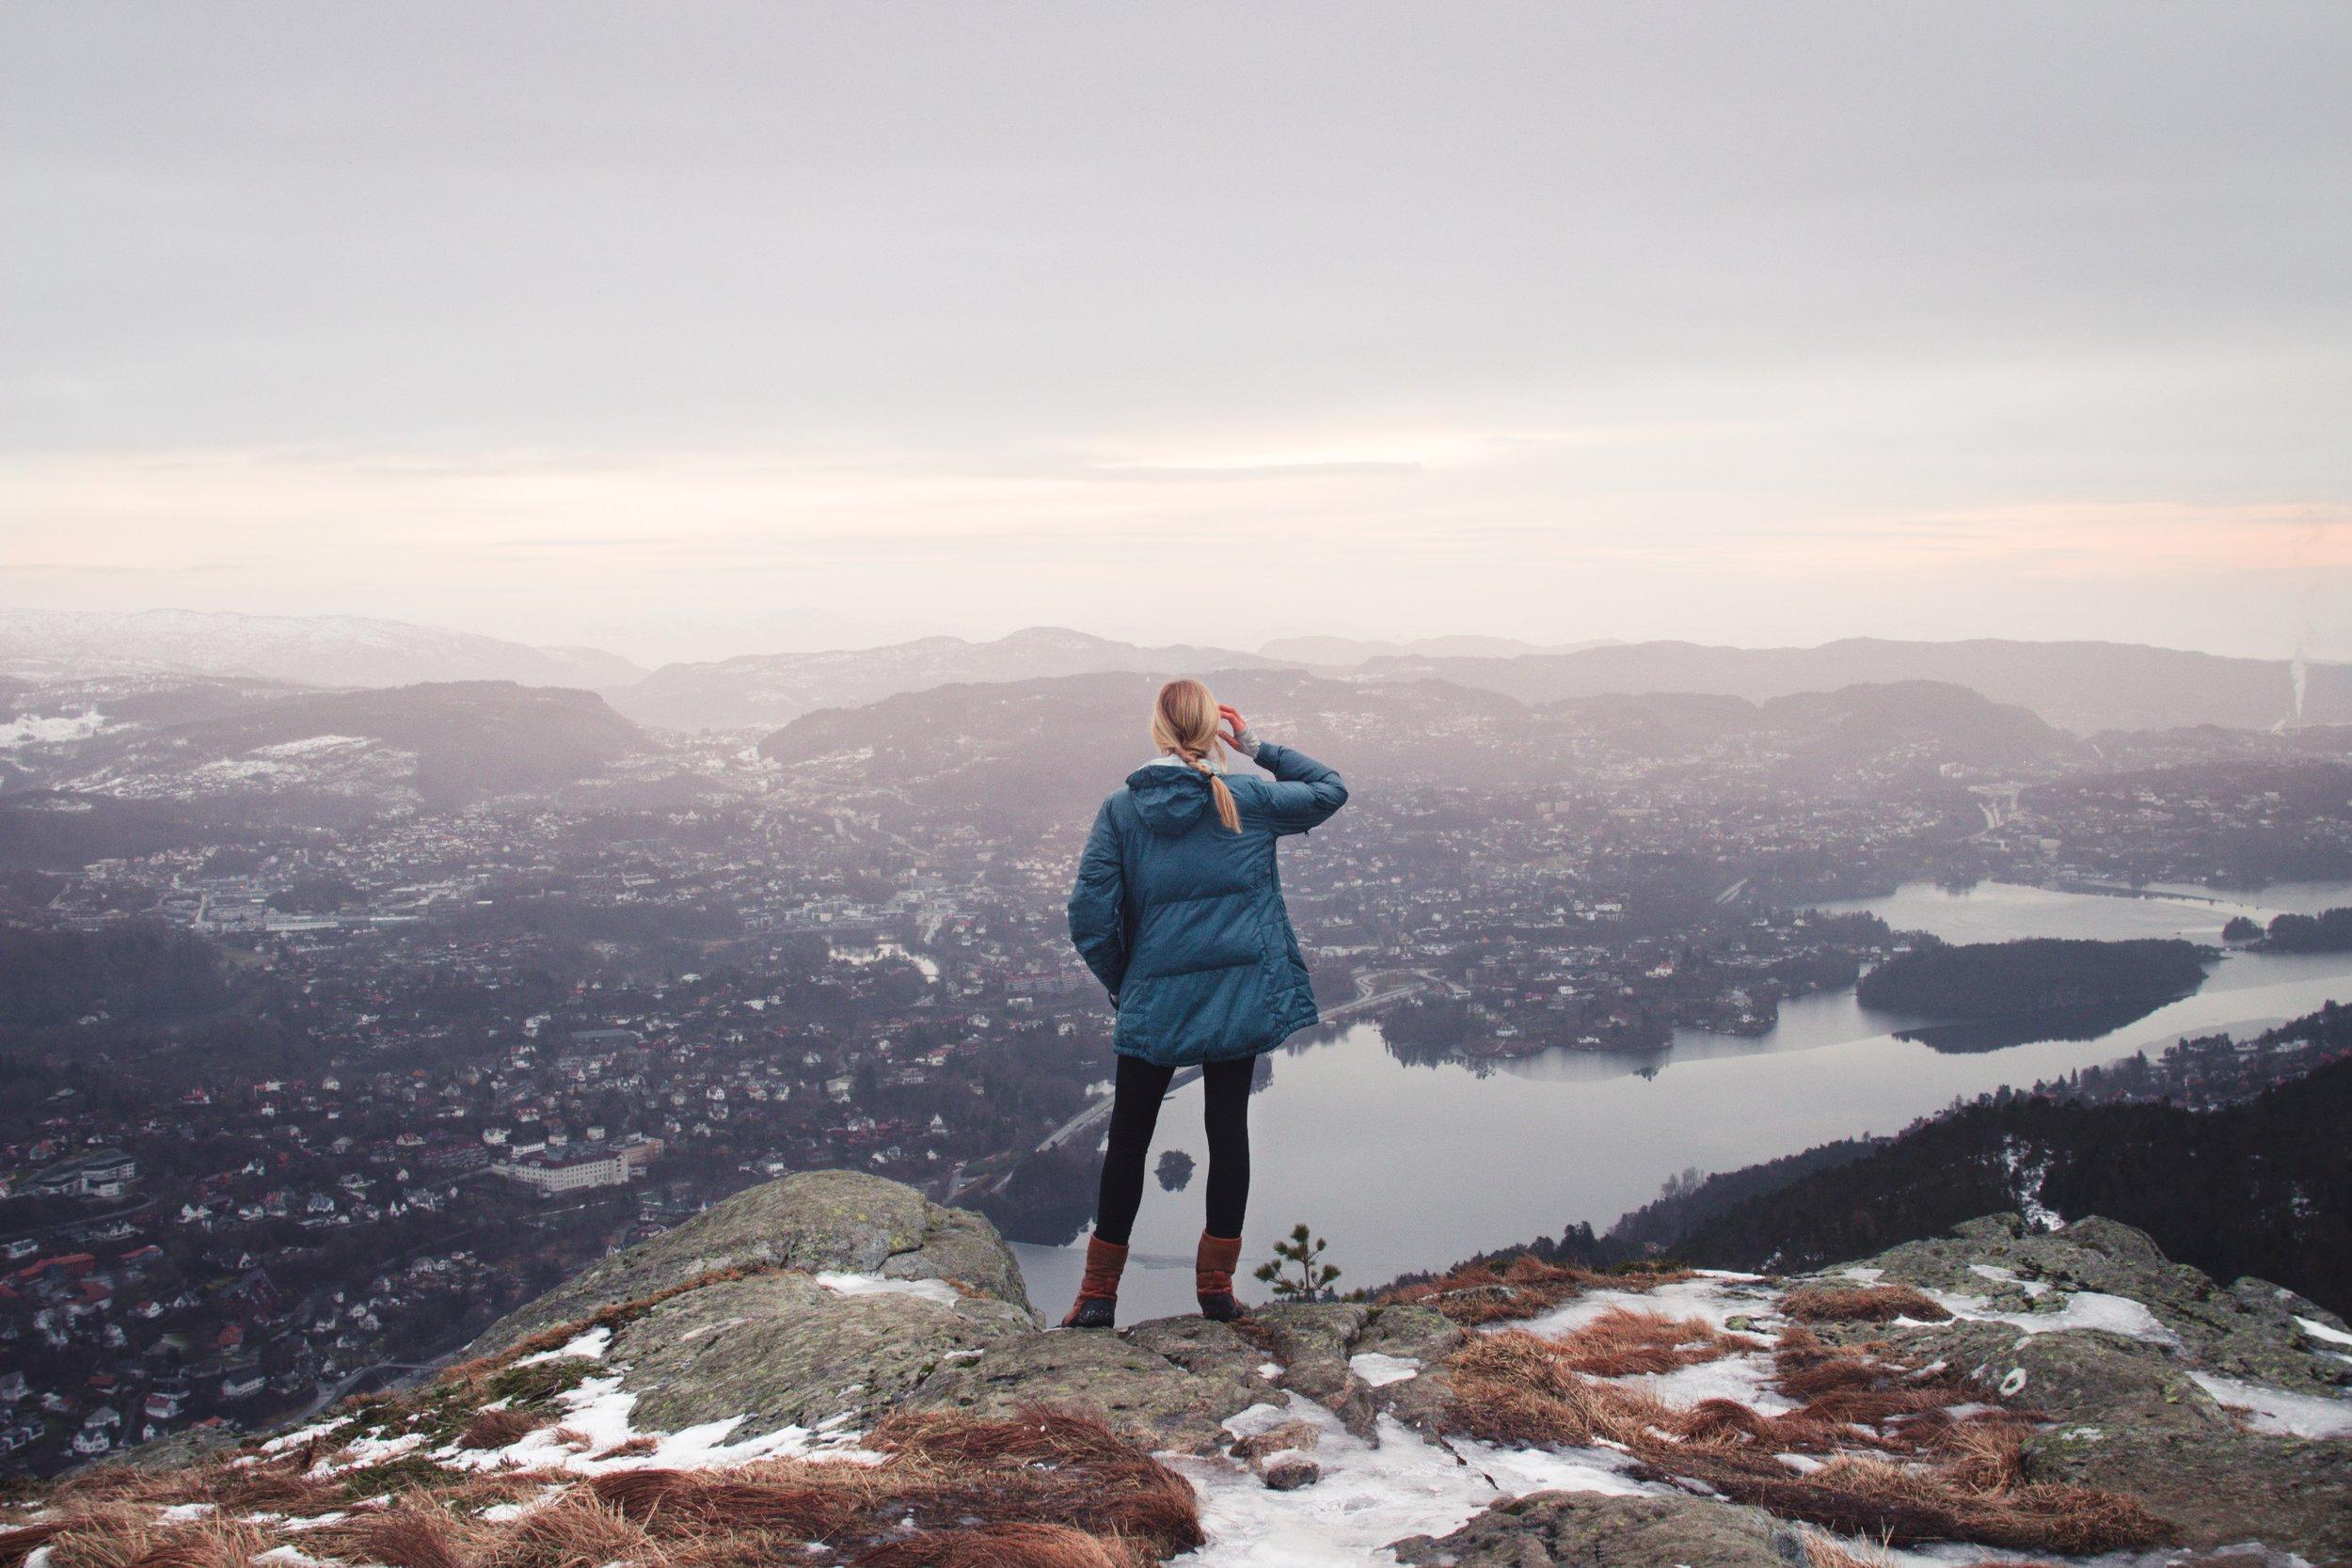 bergen winter workshops dionne yoga norway sharon-christina-rorvik